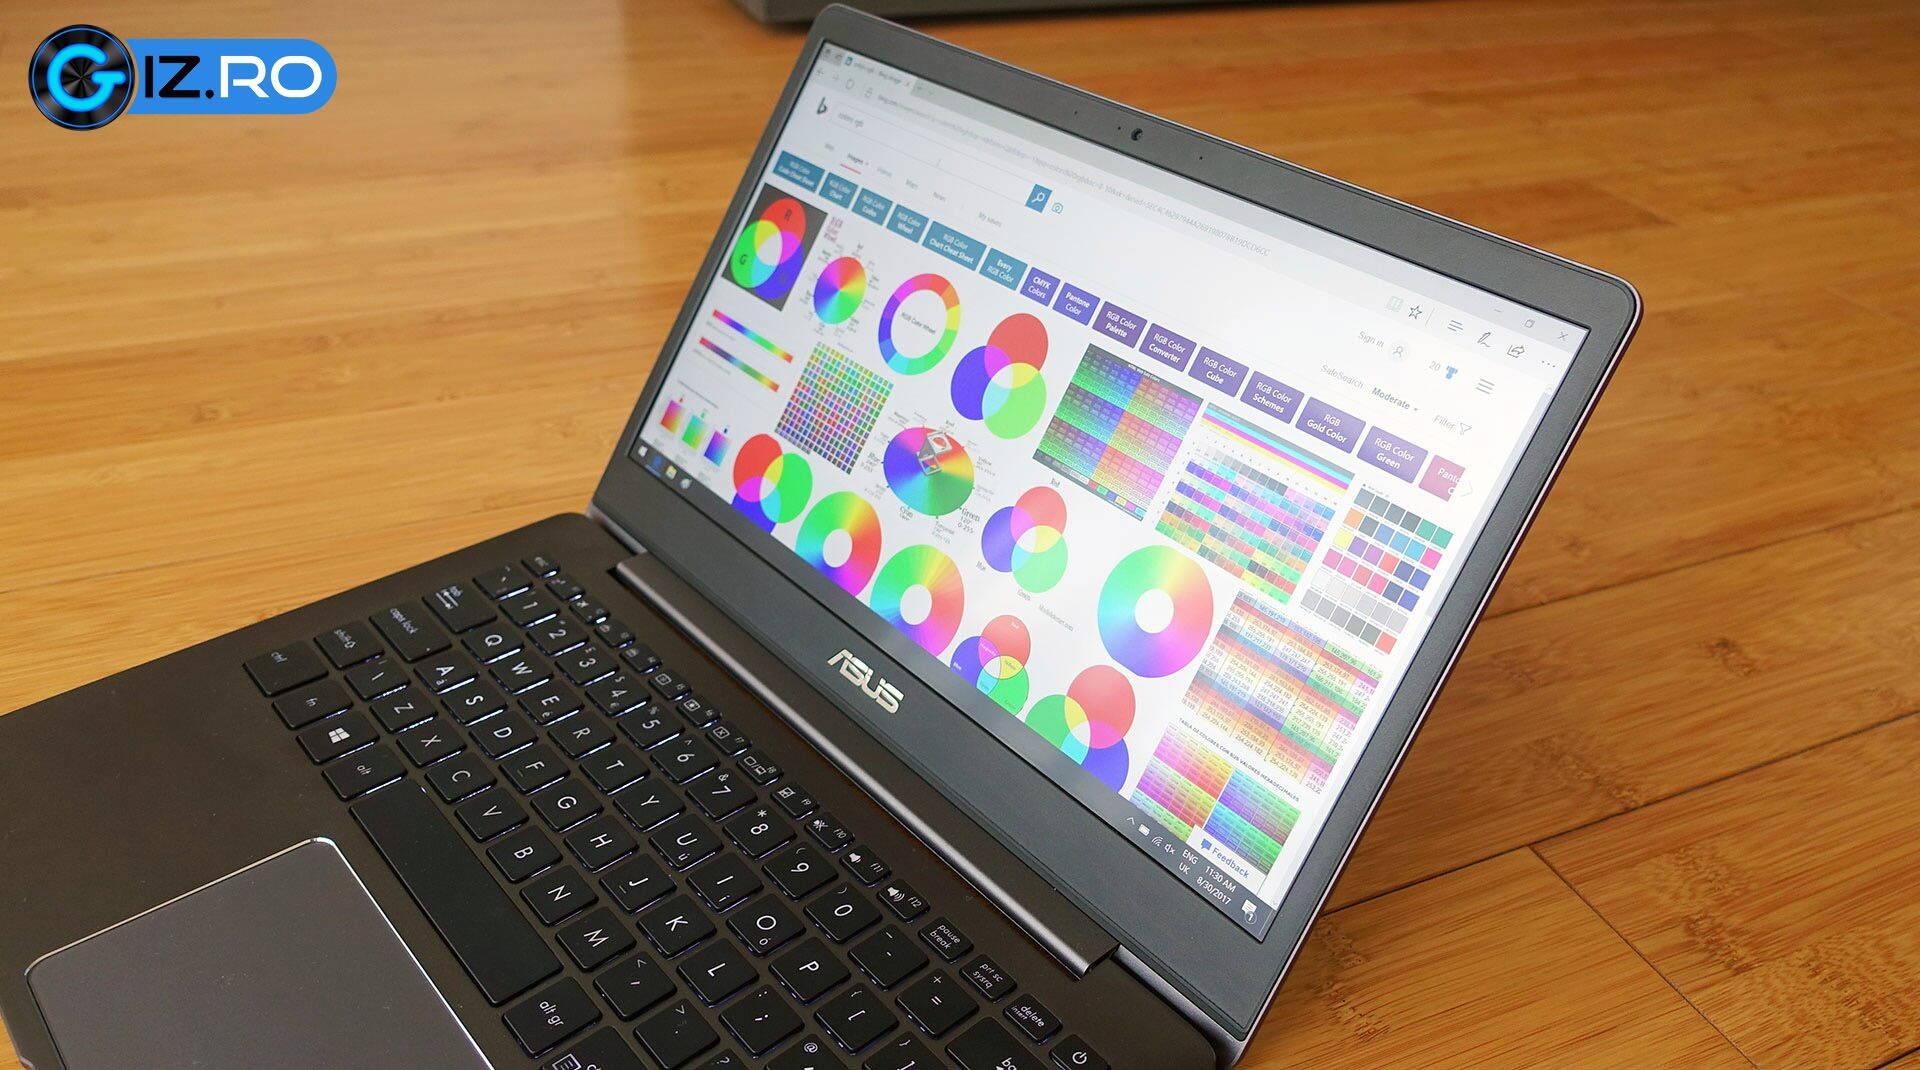 asus-zenbook-13-ux331-screen-angle